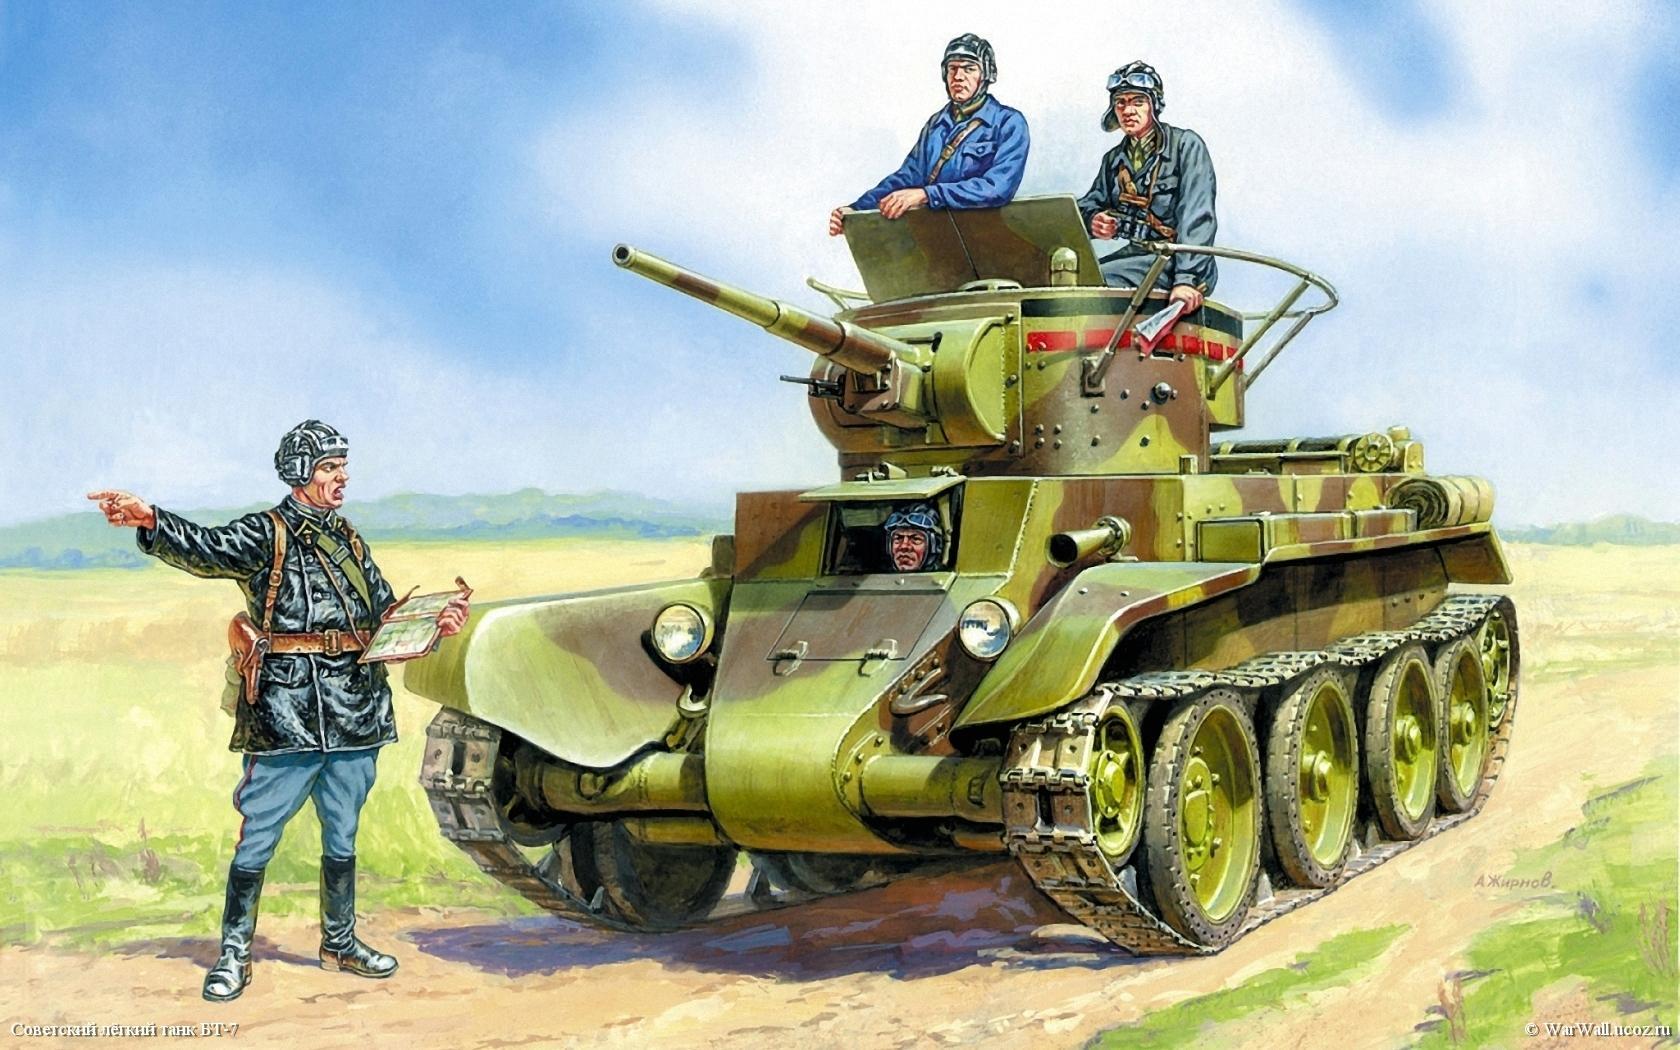 Жирнов Андрей. Легкий танк БТ-7.